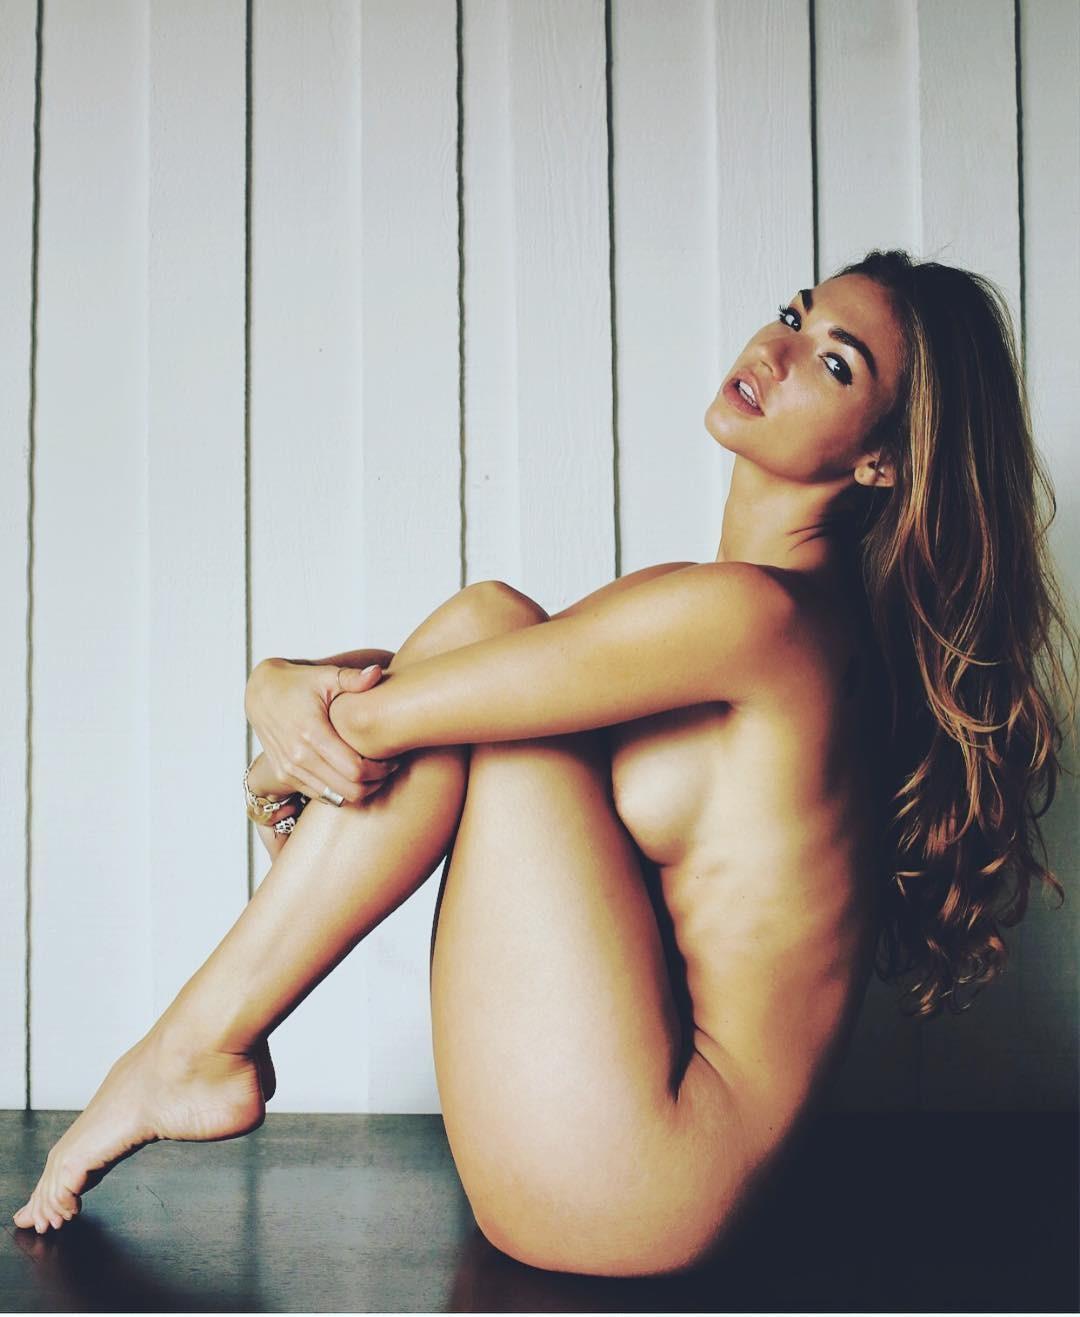 Rachel Pringle Great Nude Photos, Fit Body